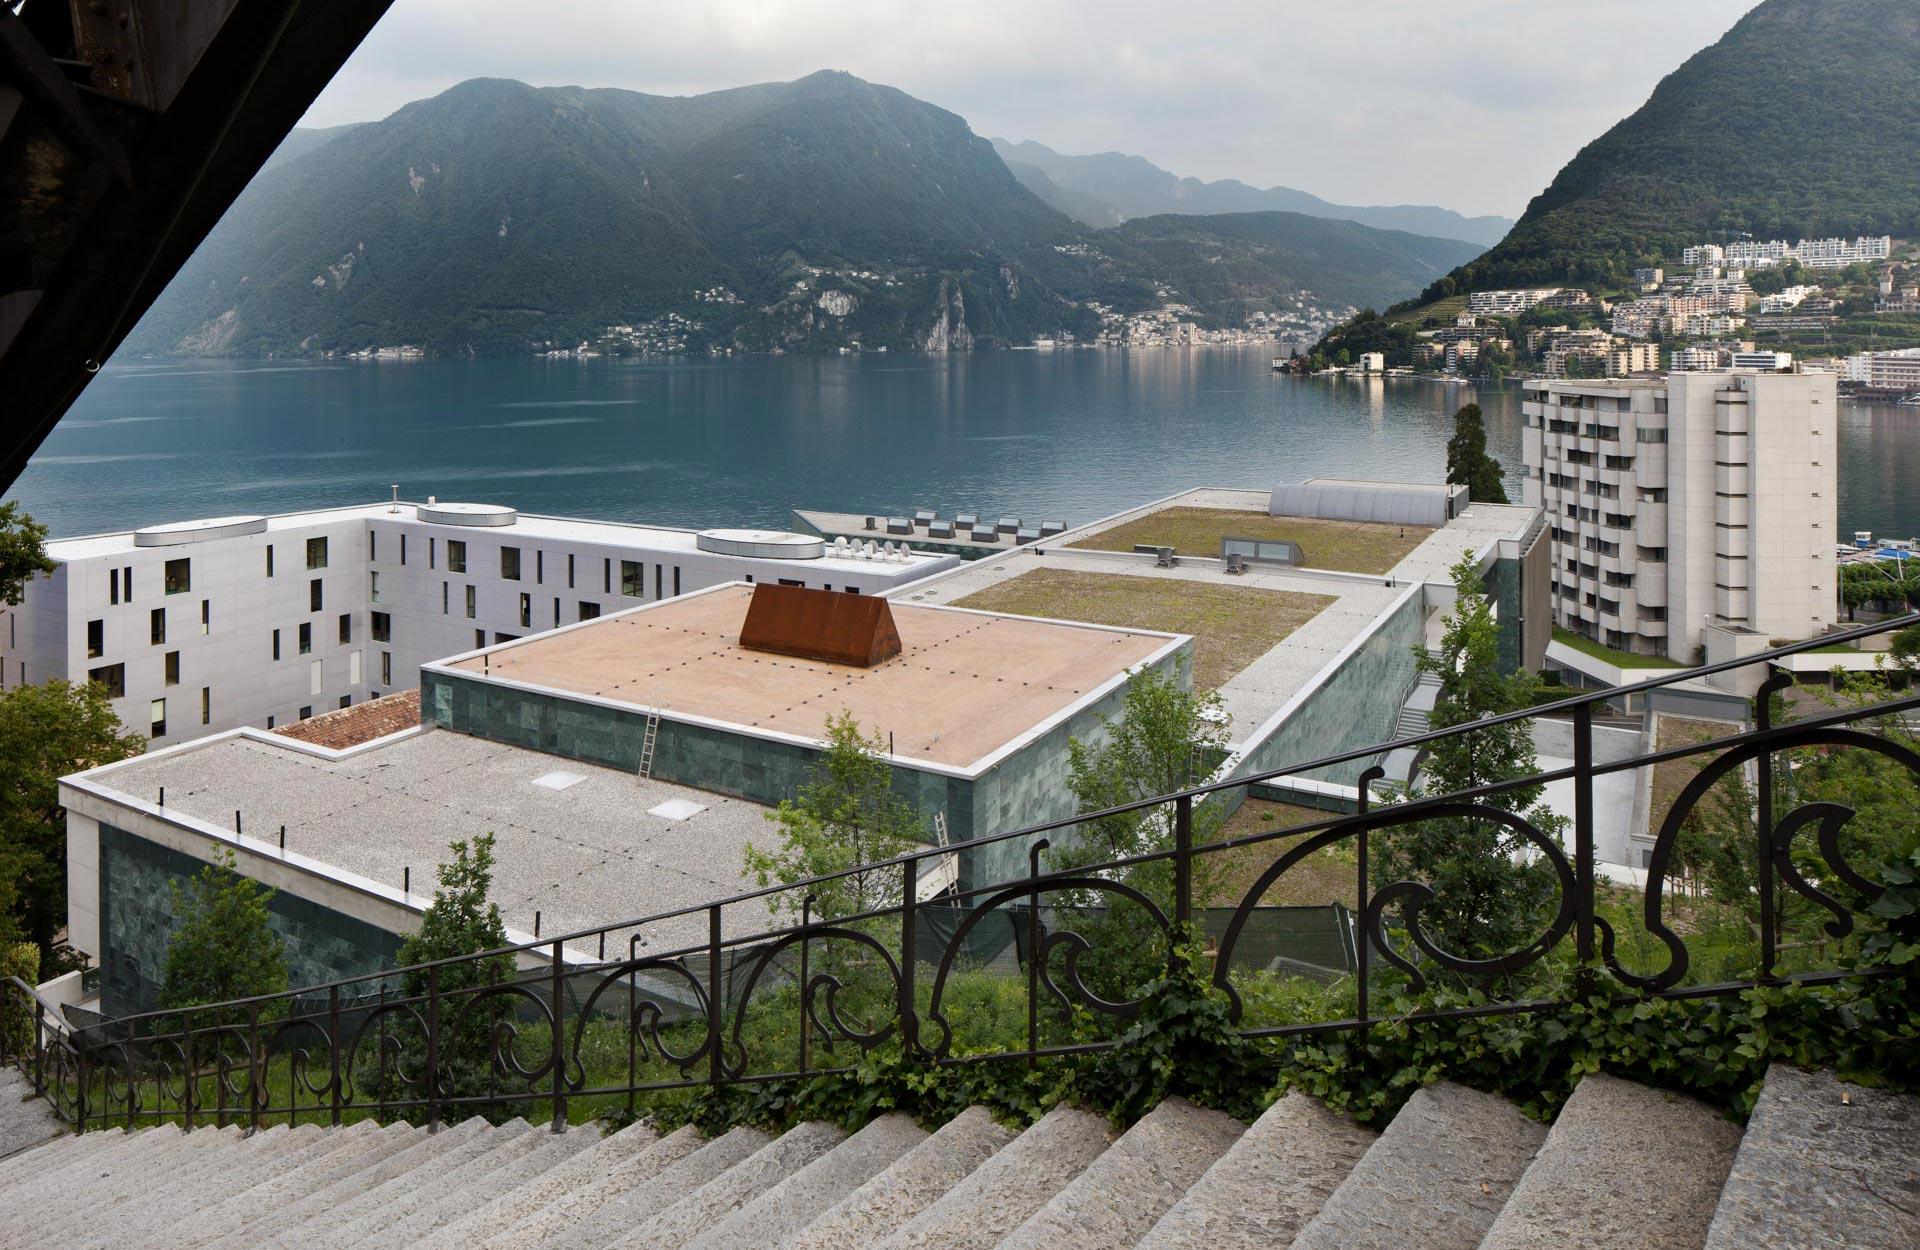 Lugano Arte Cultura panorama